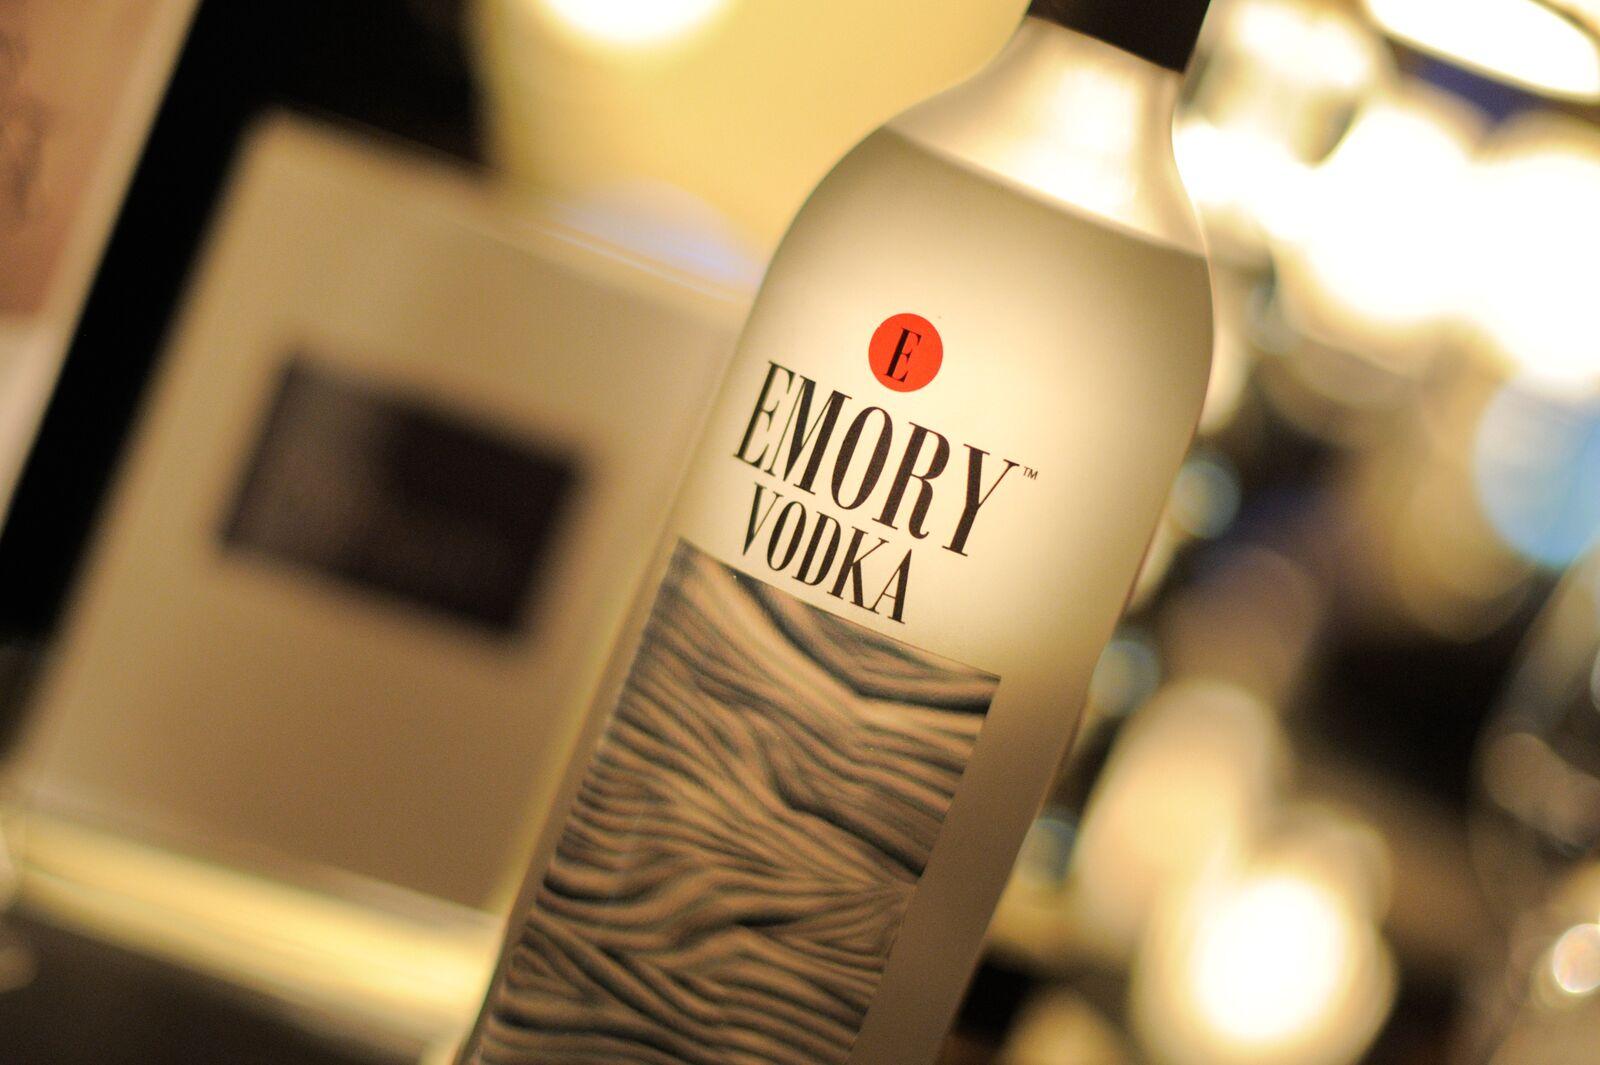 Emory vodka to launch guerilla marketing campaign at art basel emory vodka to launch guerilla marketing campaign at art basel miami bevnet reviewsmspy